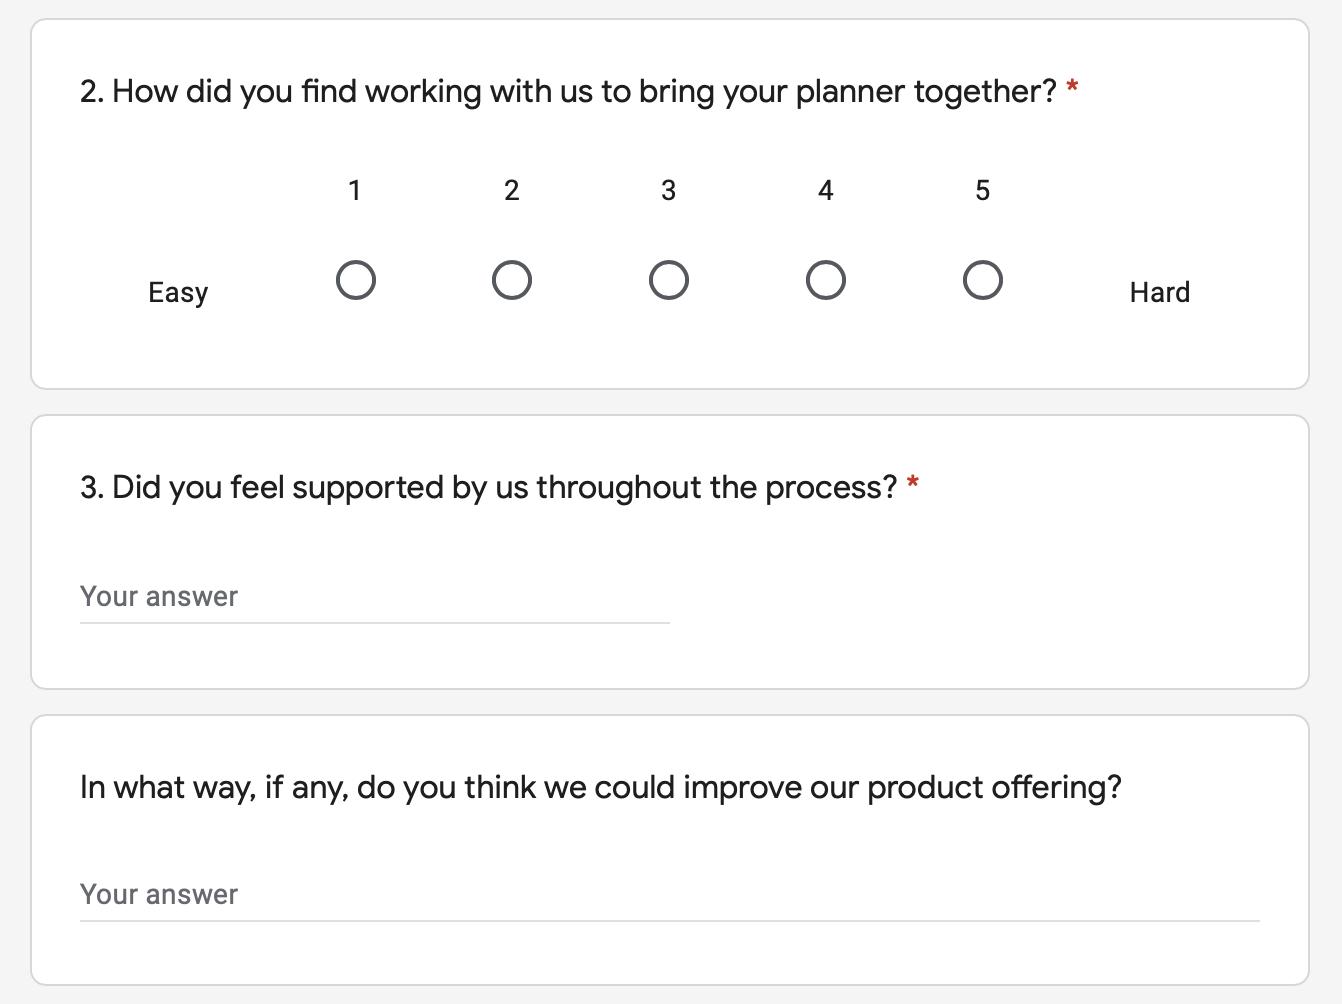 2021 Planner Survey